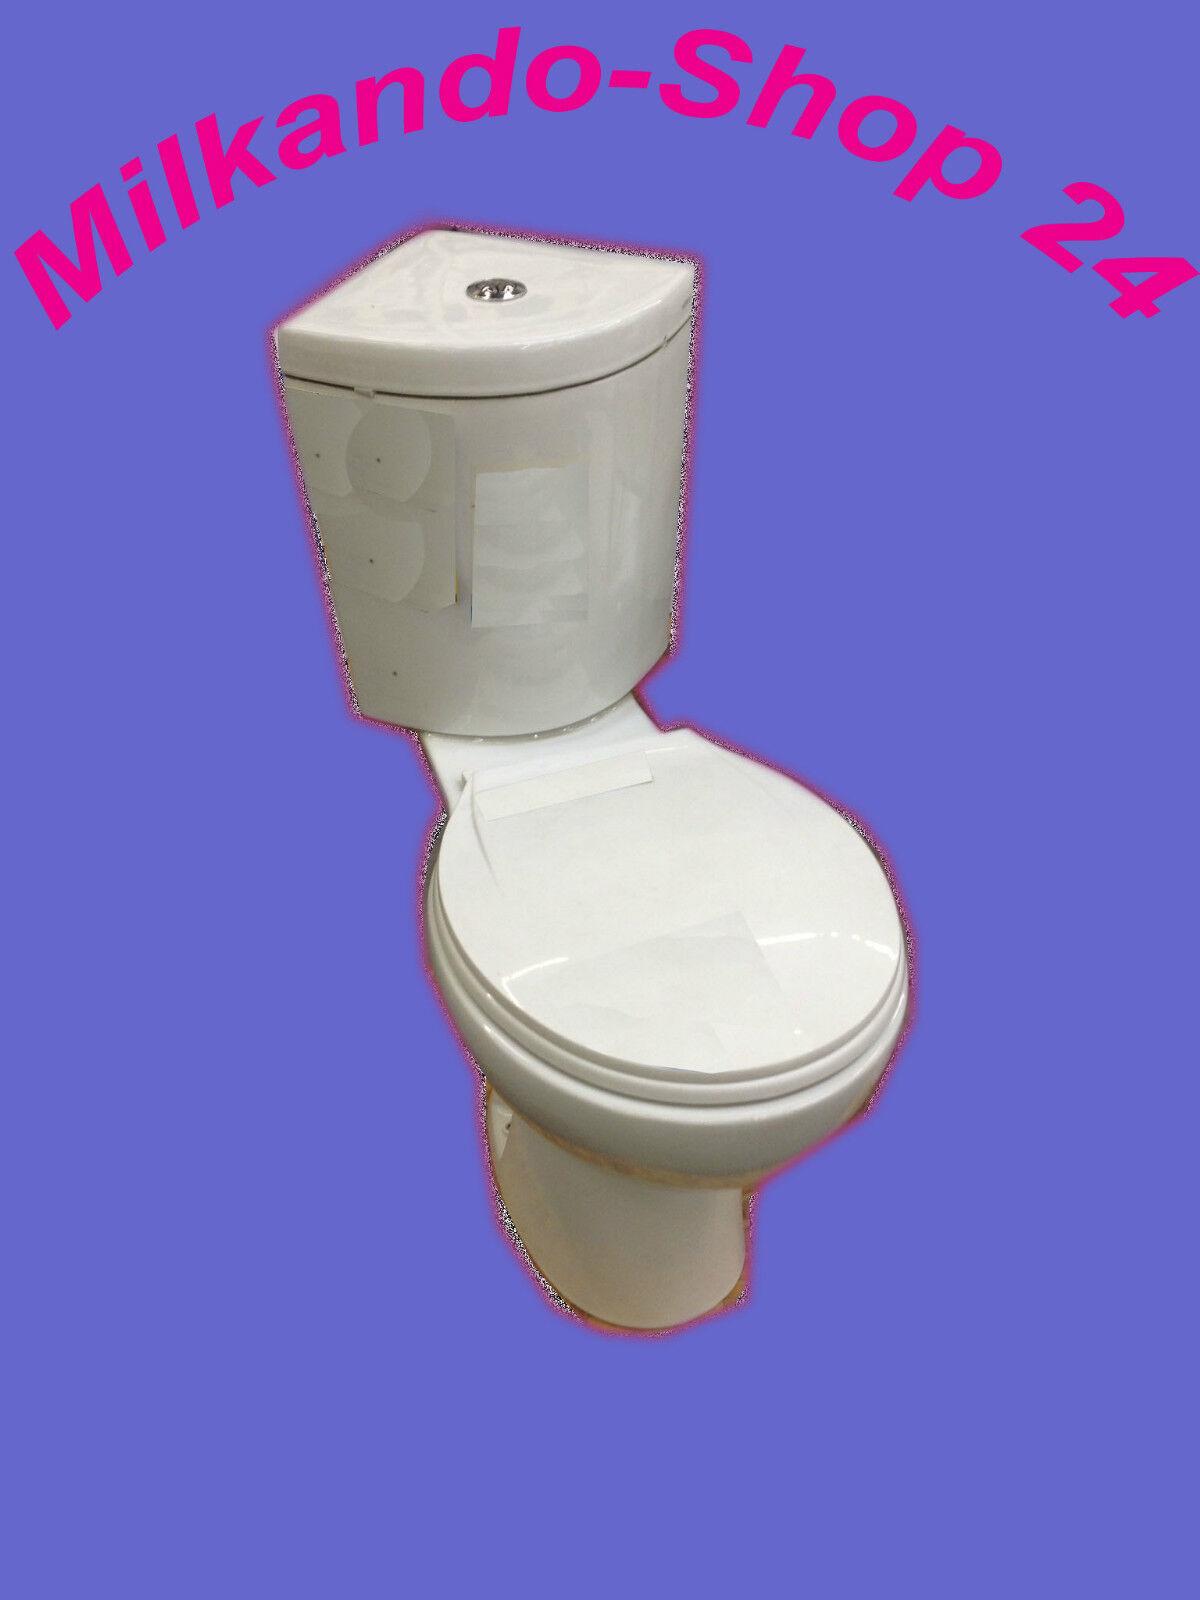 design eck toilette wc stand komplett set mit sp lkasten keramik ecksp lkasten ebay. Black Bedroom Furniture Sets. Home Design Ideas